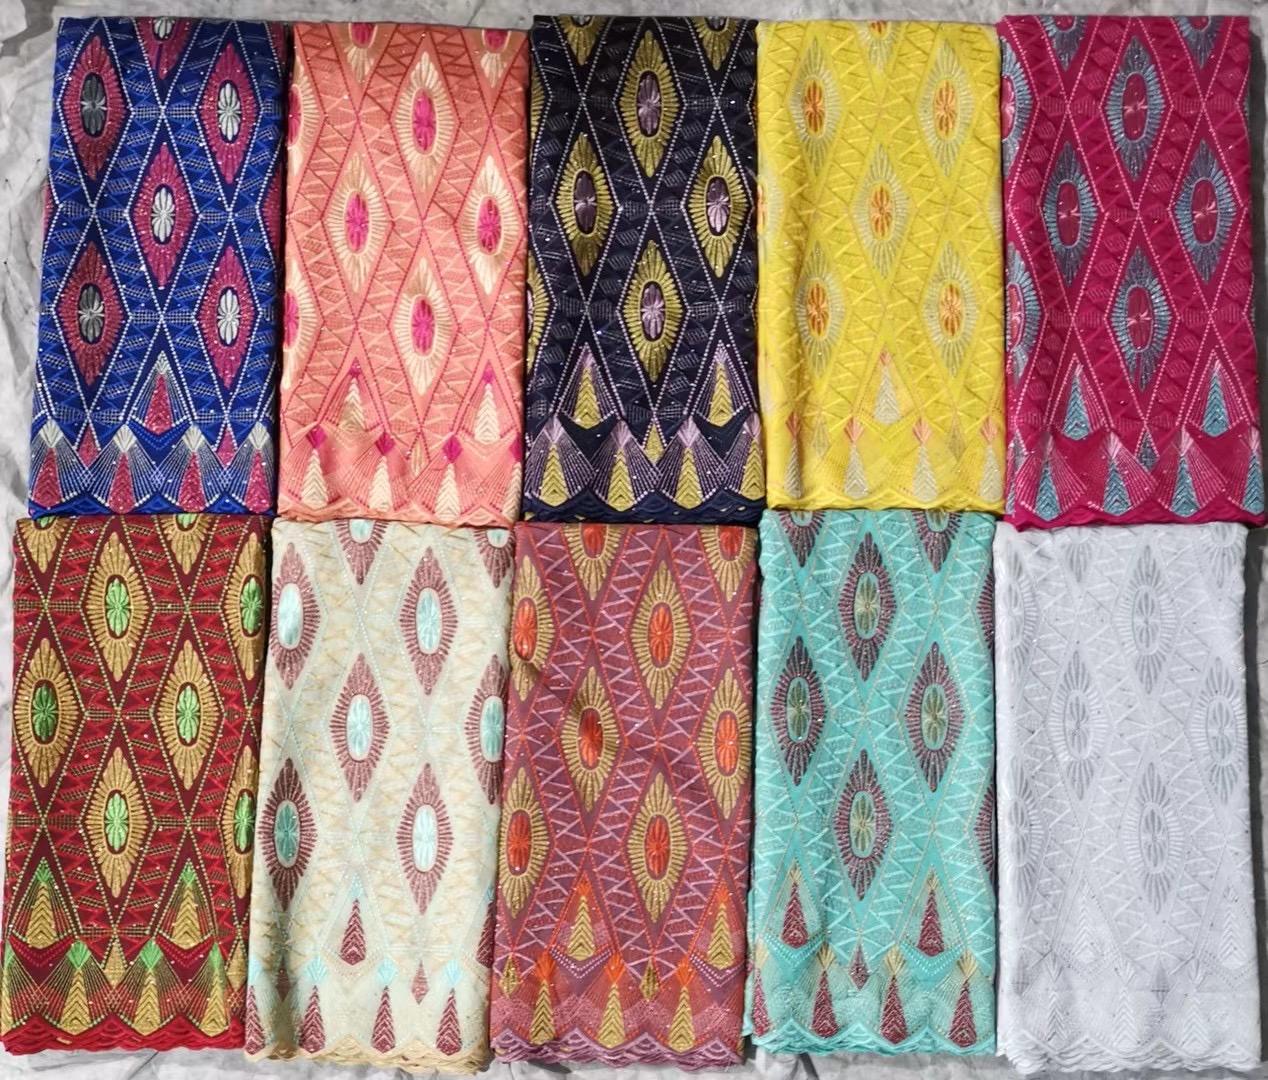 High Quality Swiss Cotton Voile Lace Austria Voile Swiss Lace Fabric African Swiss Cotton Voile For Garment